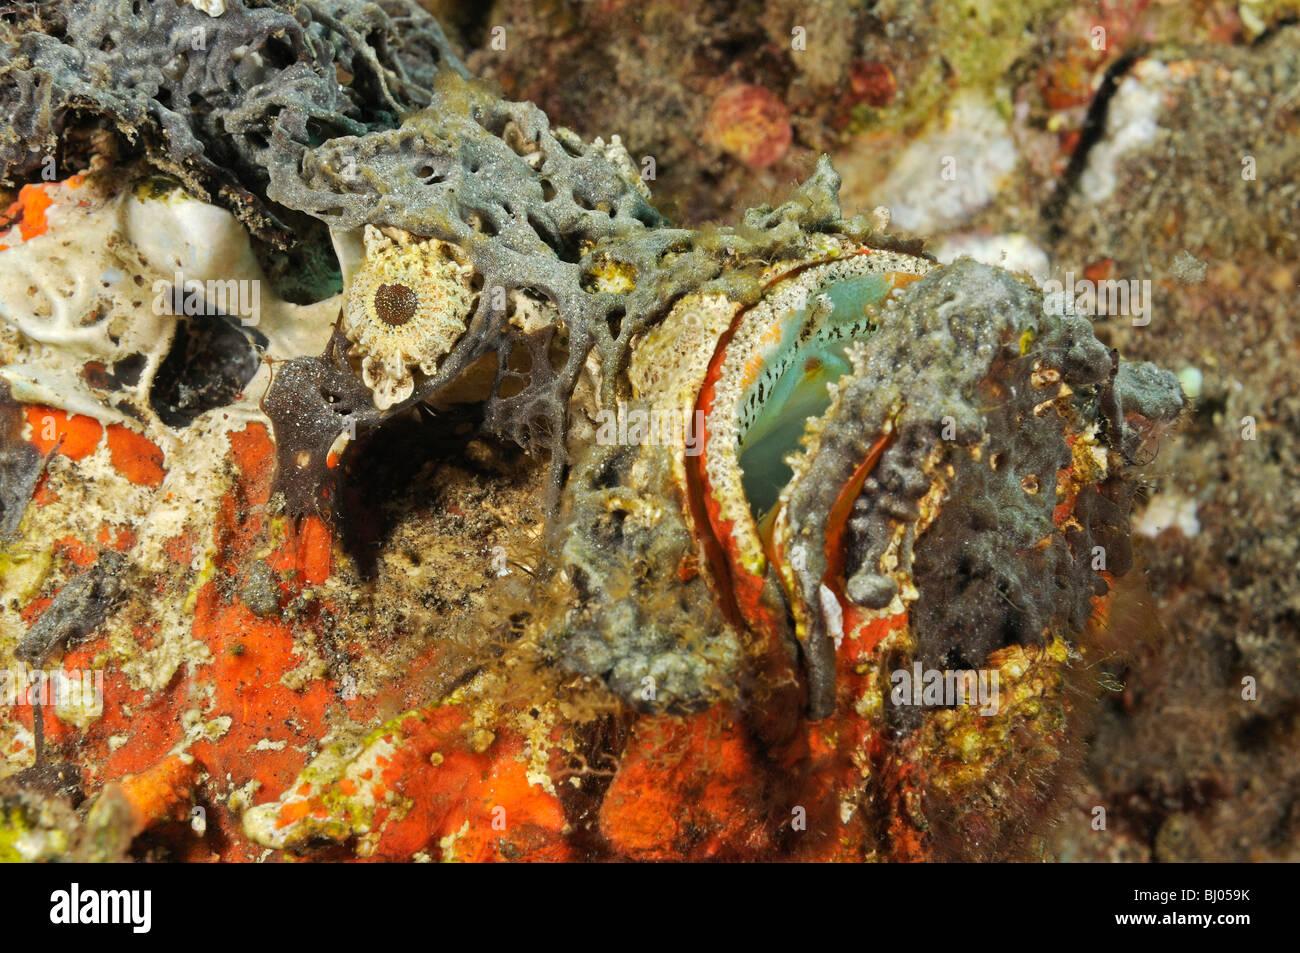 Synanceia horrida, Estuarine Stonefish, head, Tulamben, Bali, Indonesia, Indo-Pacific Ocean - Stock Image